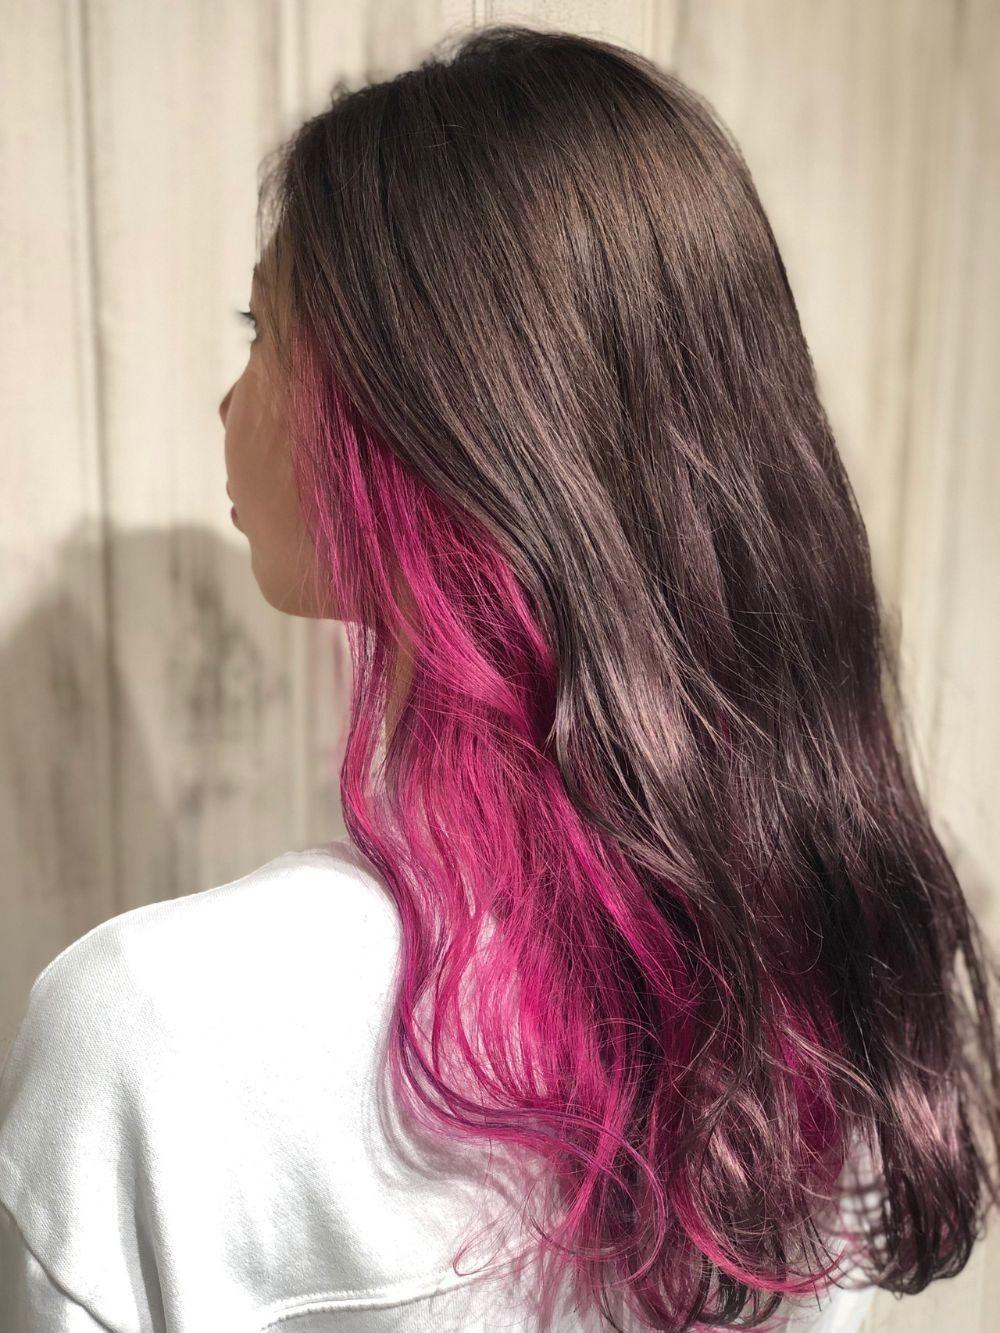 Pin By Audrey Vance On Hair In 2020 Hair Color Streaks Hair Color Underneath Dyed Blonde Hair